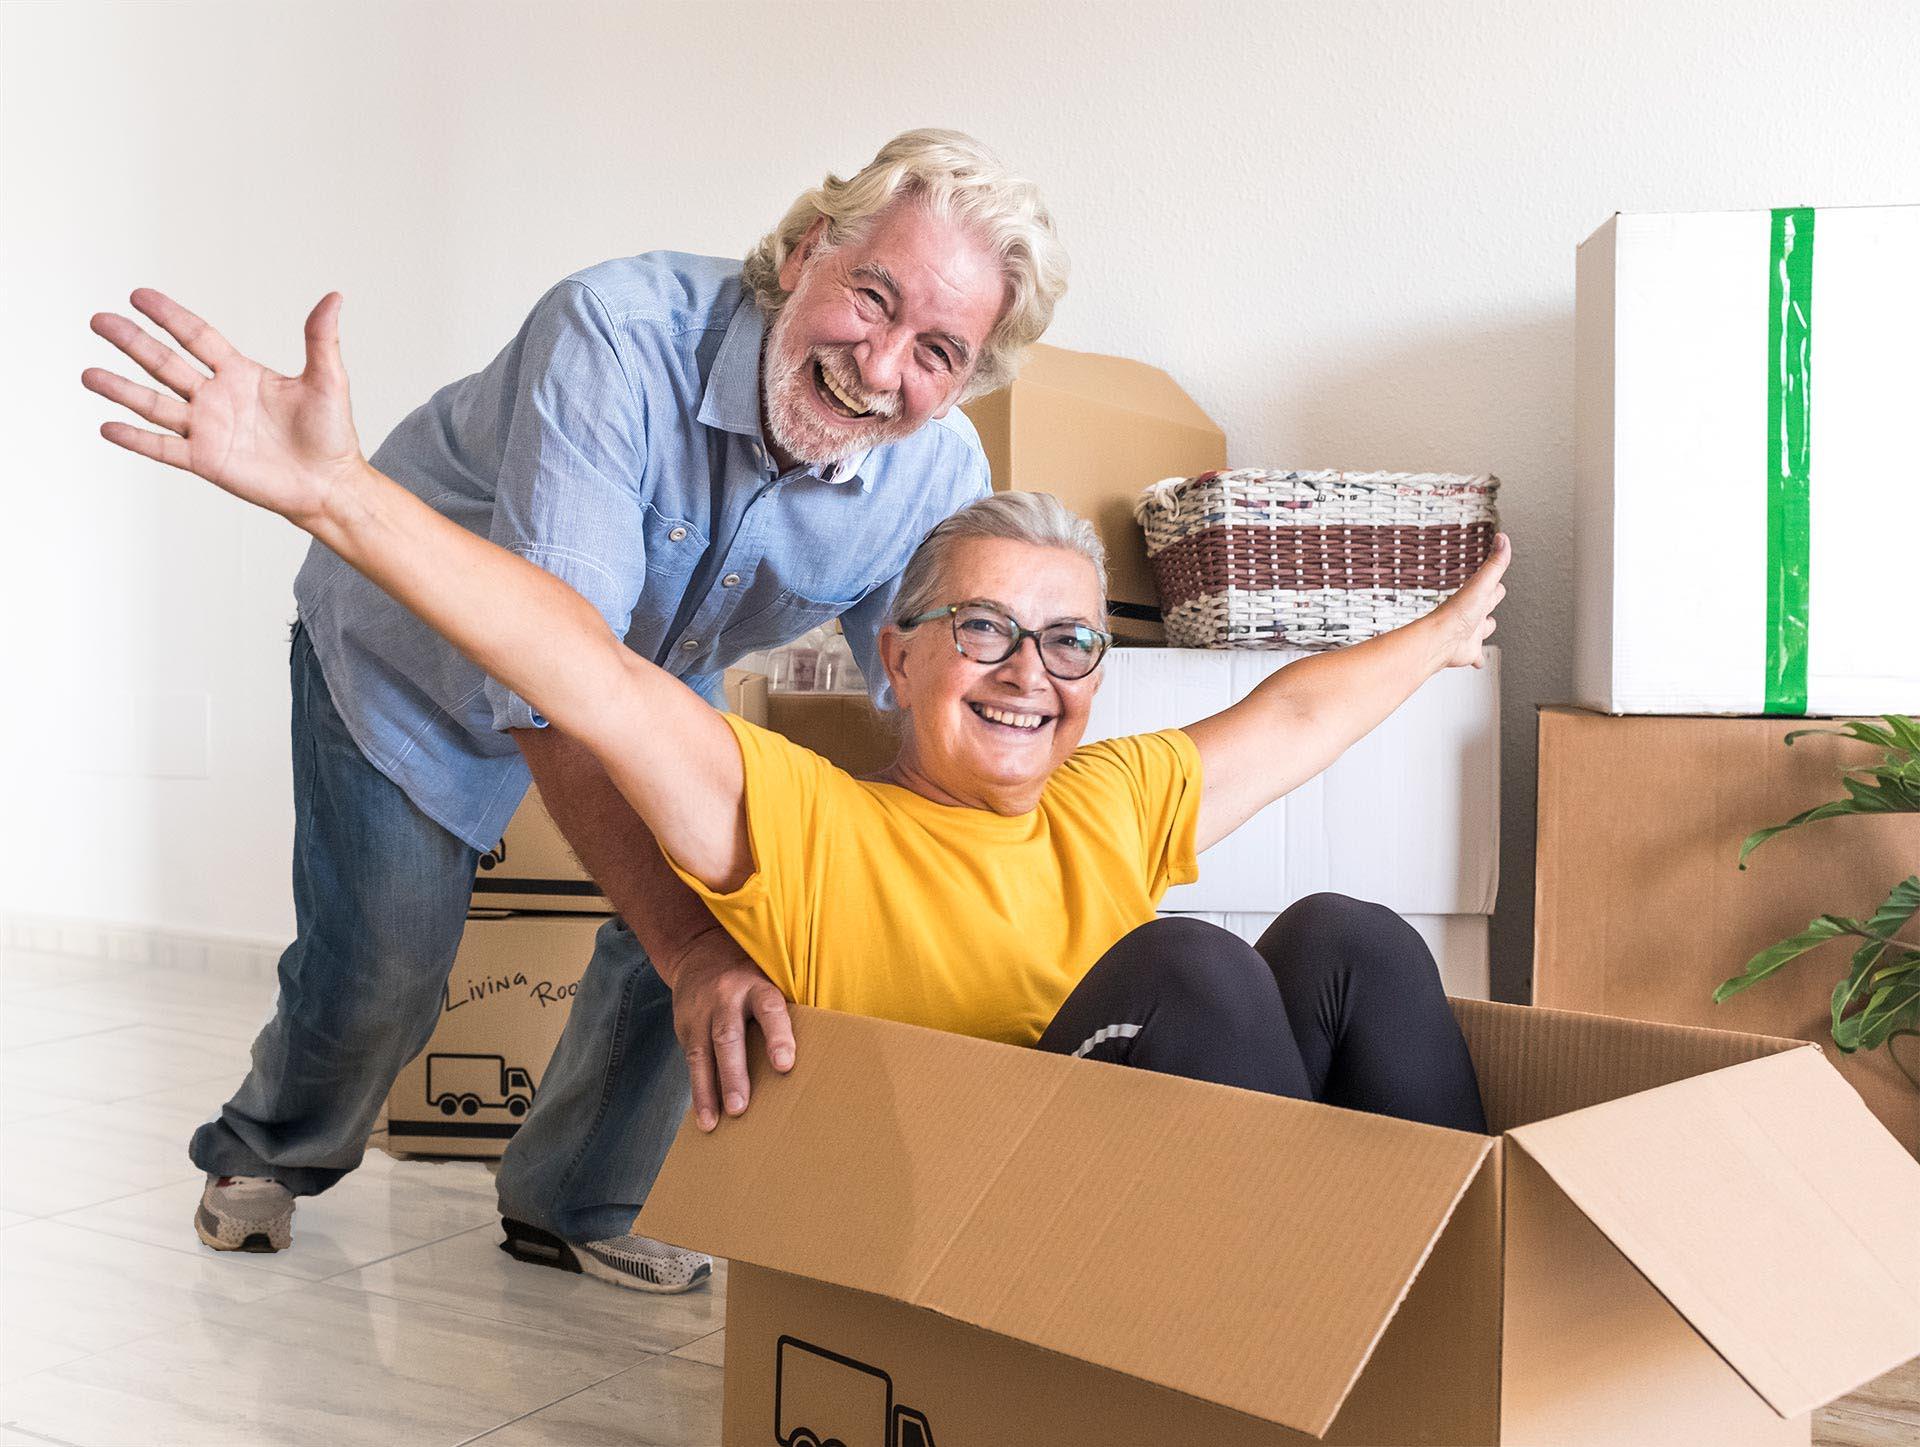 Arbors New Resident Offer - Couple Moving